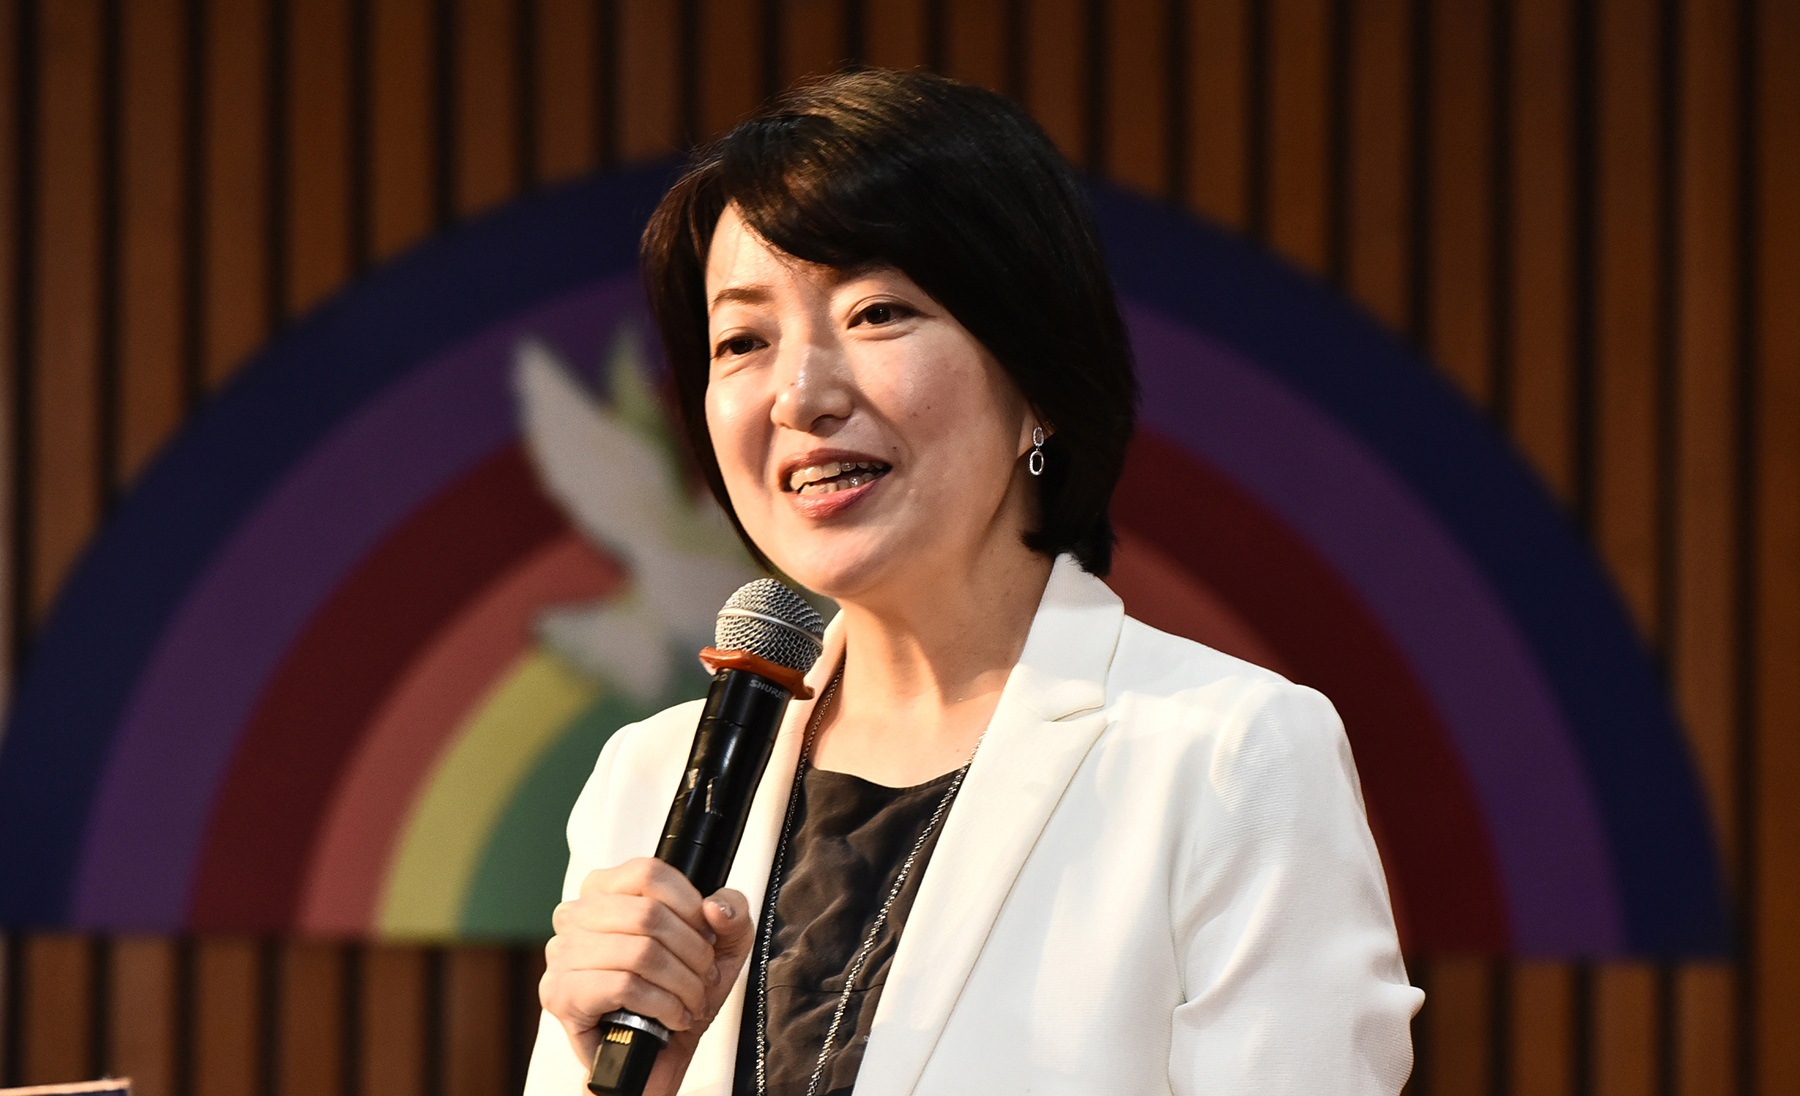 QUEST MUN Opening Ceremony - 25th October, 2018  Chief Guest - Derk Segaar, Director, UNIC  Guest of Honour - Dr. Miki Horrie, Principal, Ritsumeikan Primary School, Japan